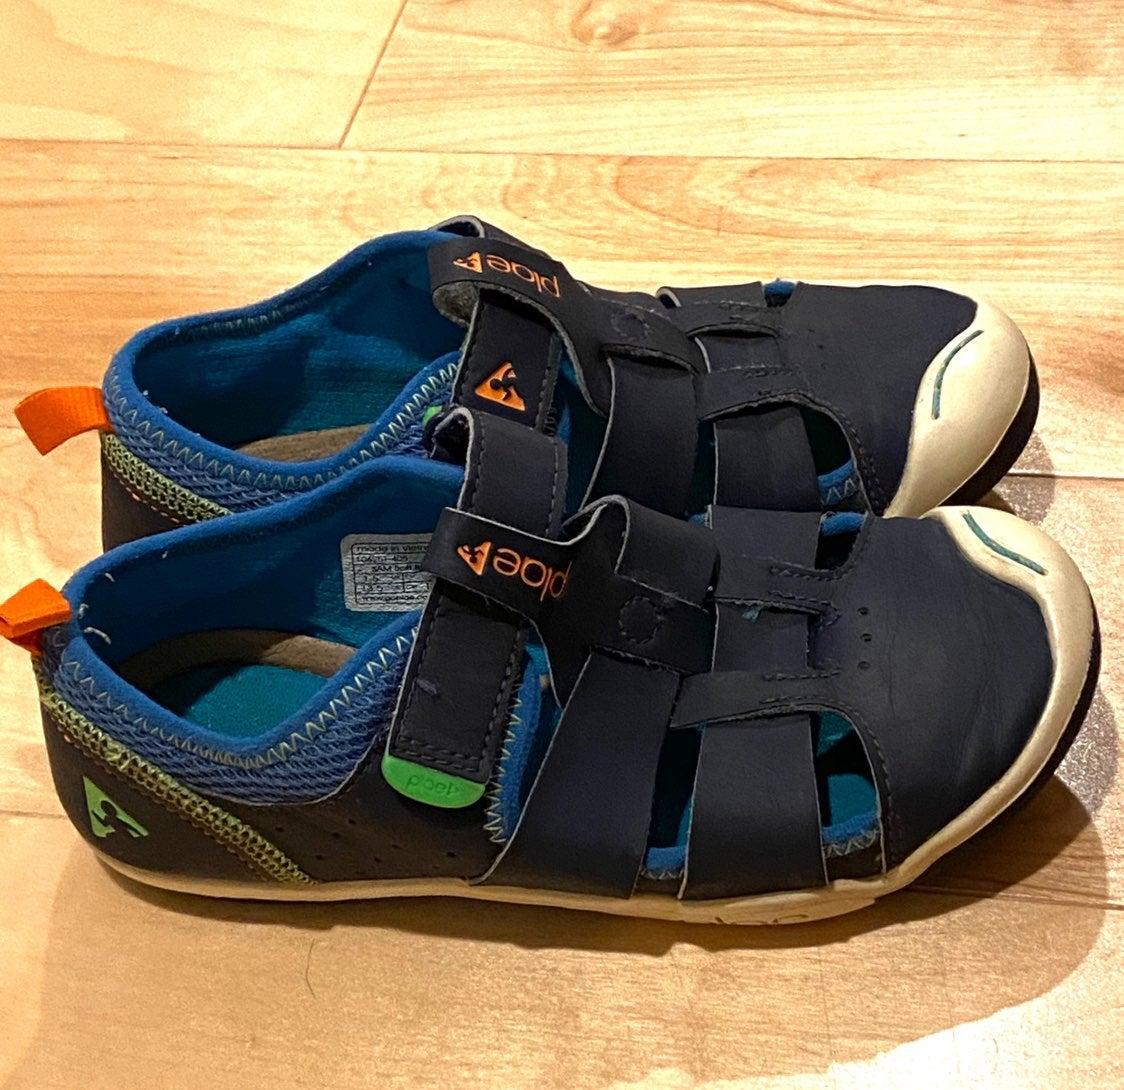 PLAE Shoes for Boys (4+) | Mercari